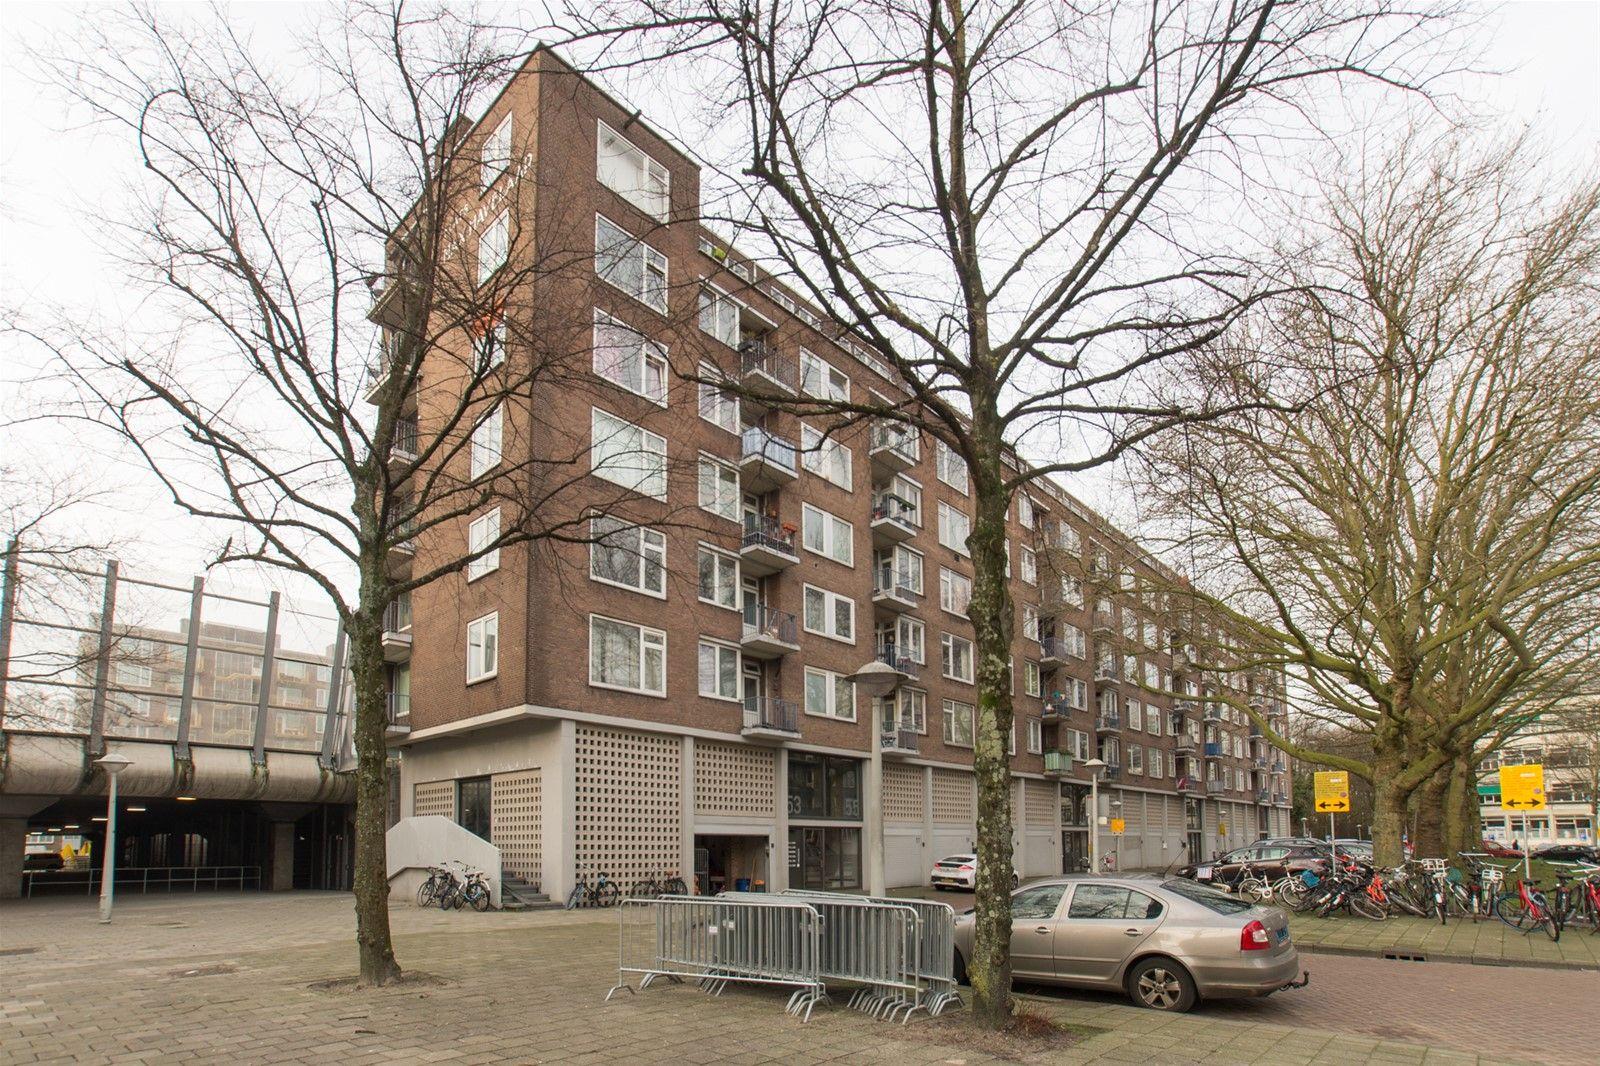 Jephtastraat, Amsterdam